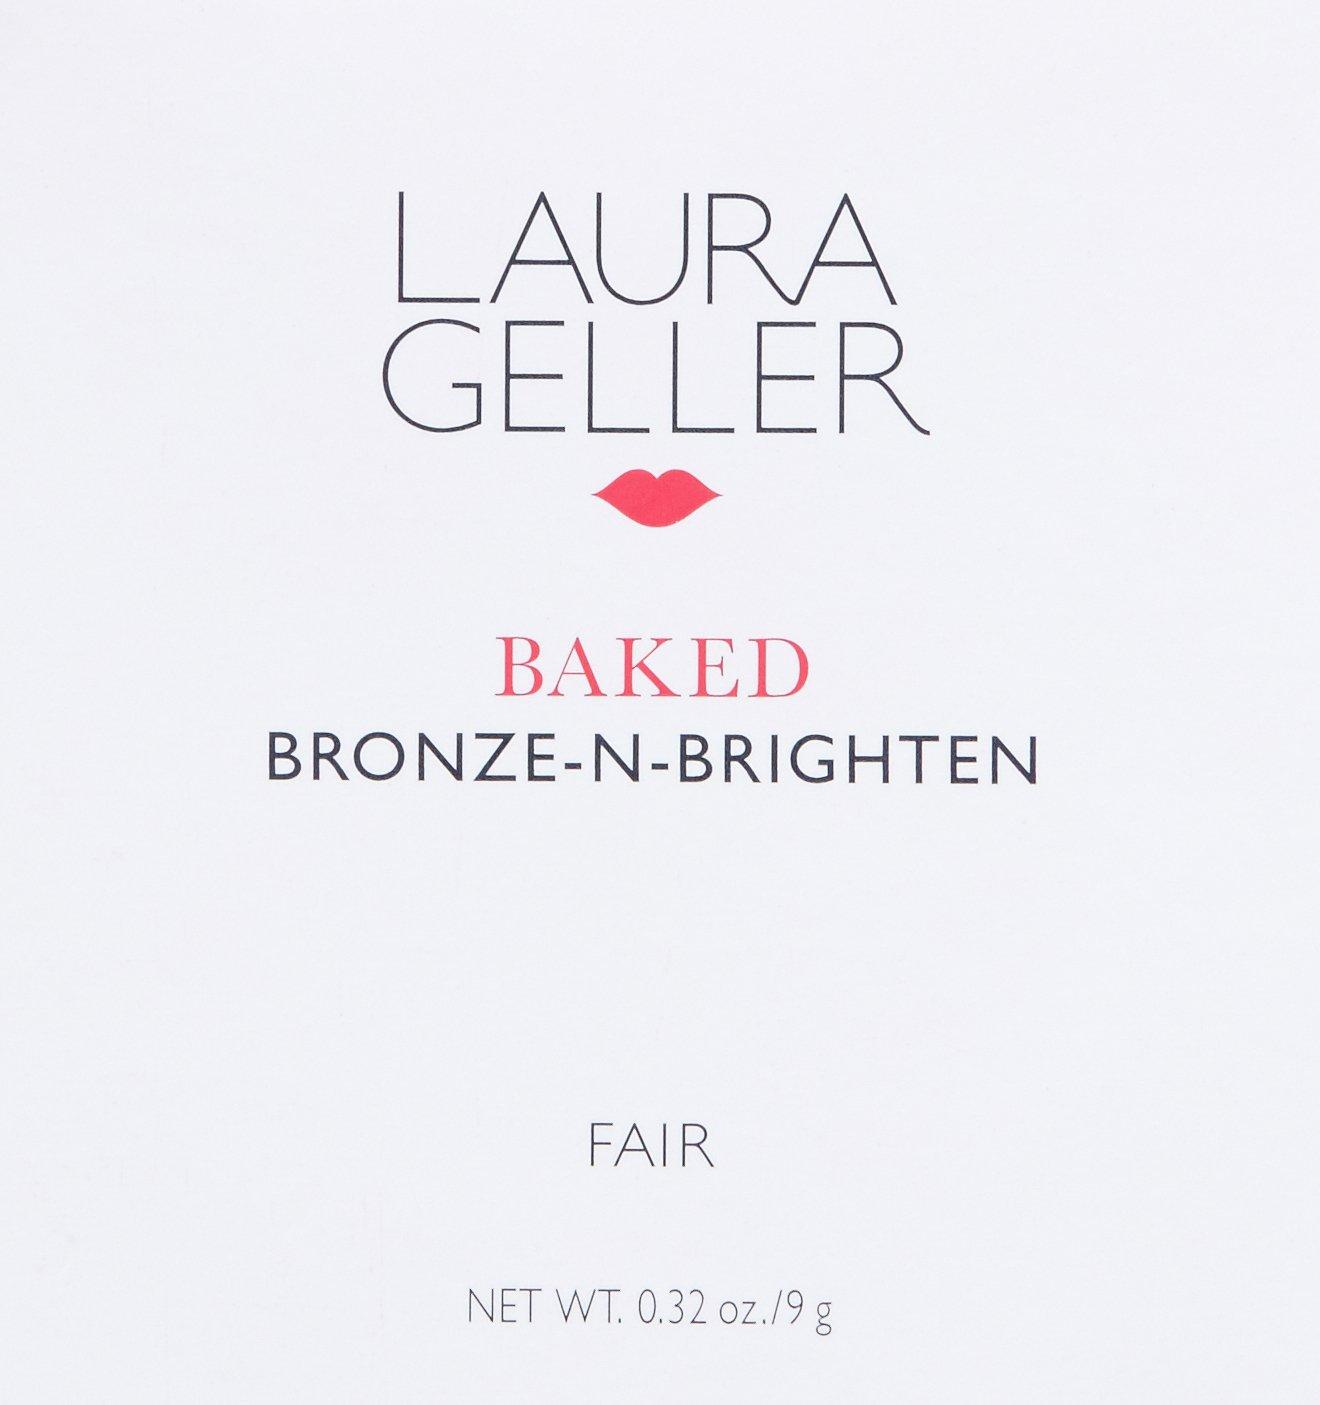 Laura Geller New York Bronze-n-Brighten by LAURA GELLER NEW YORK (Image #4)